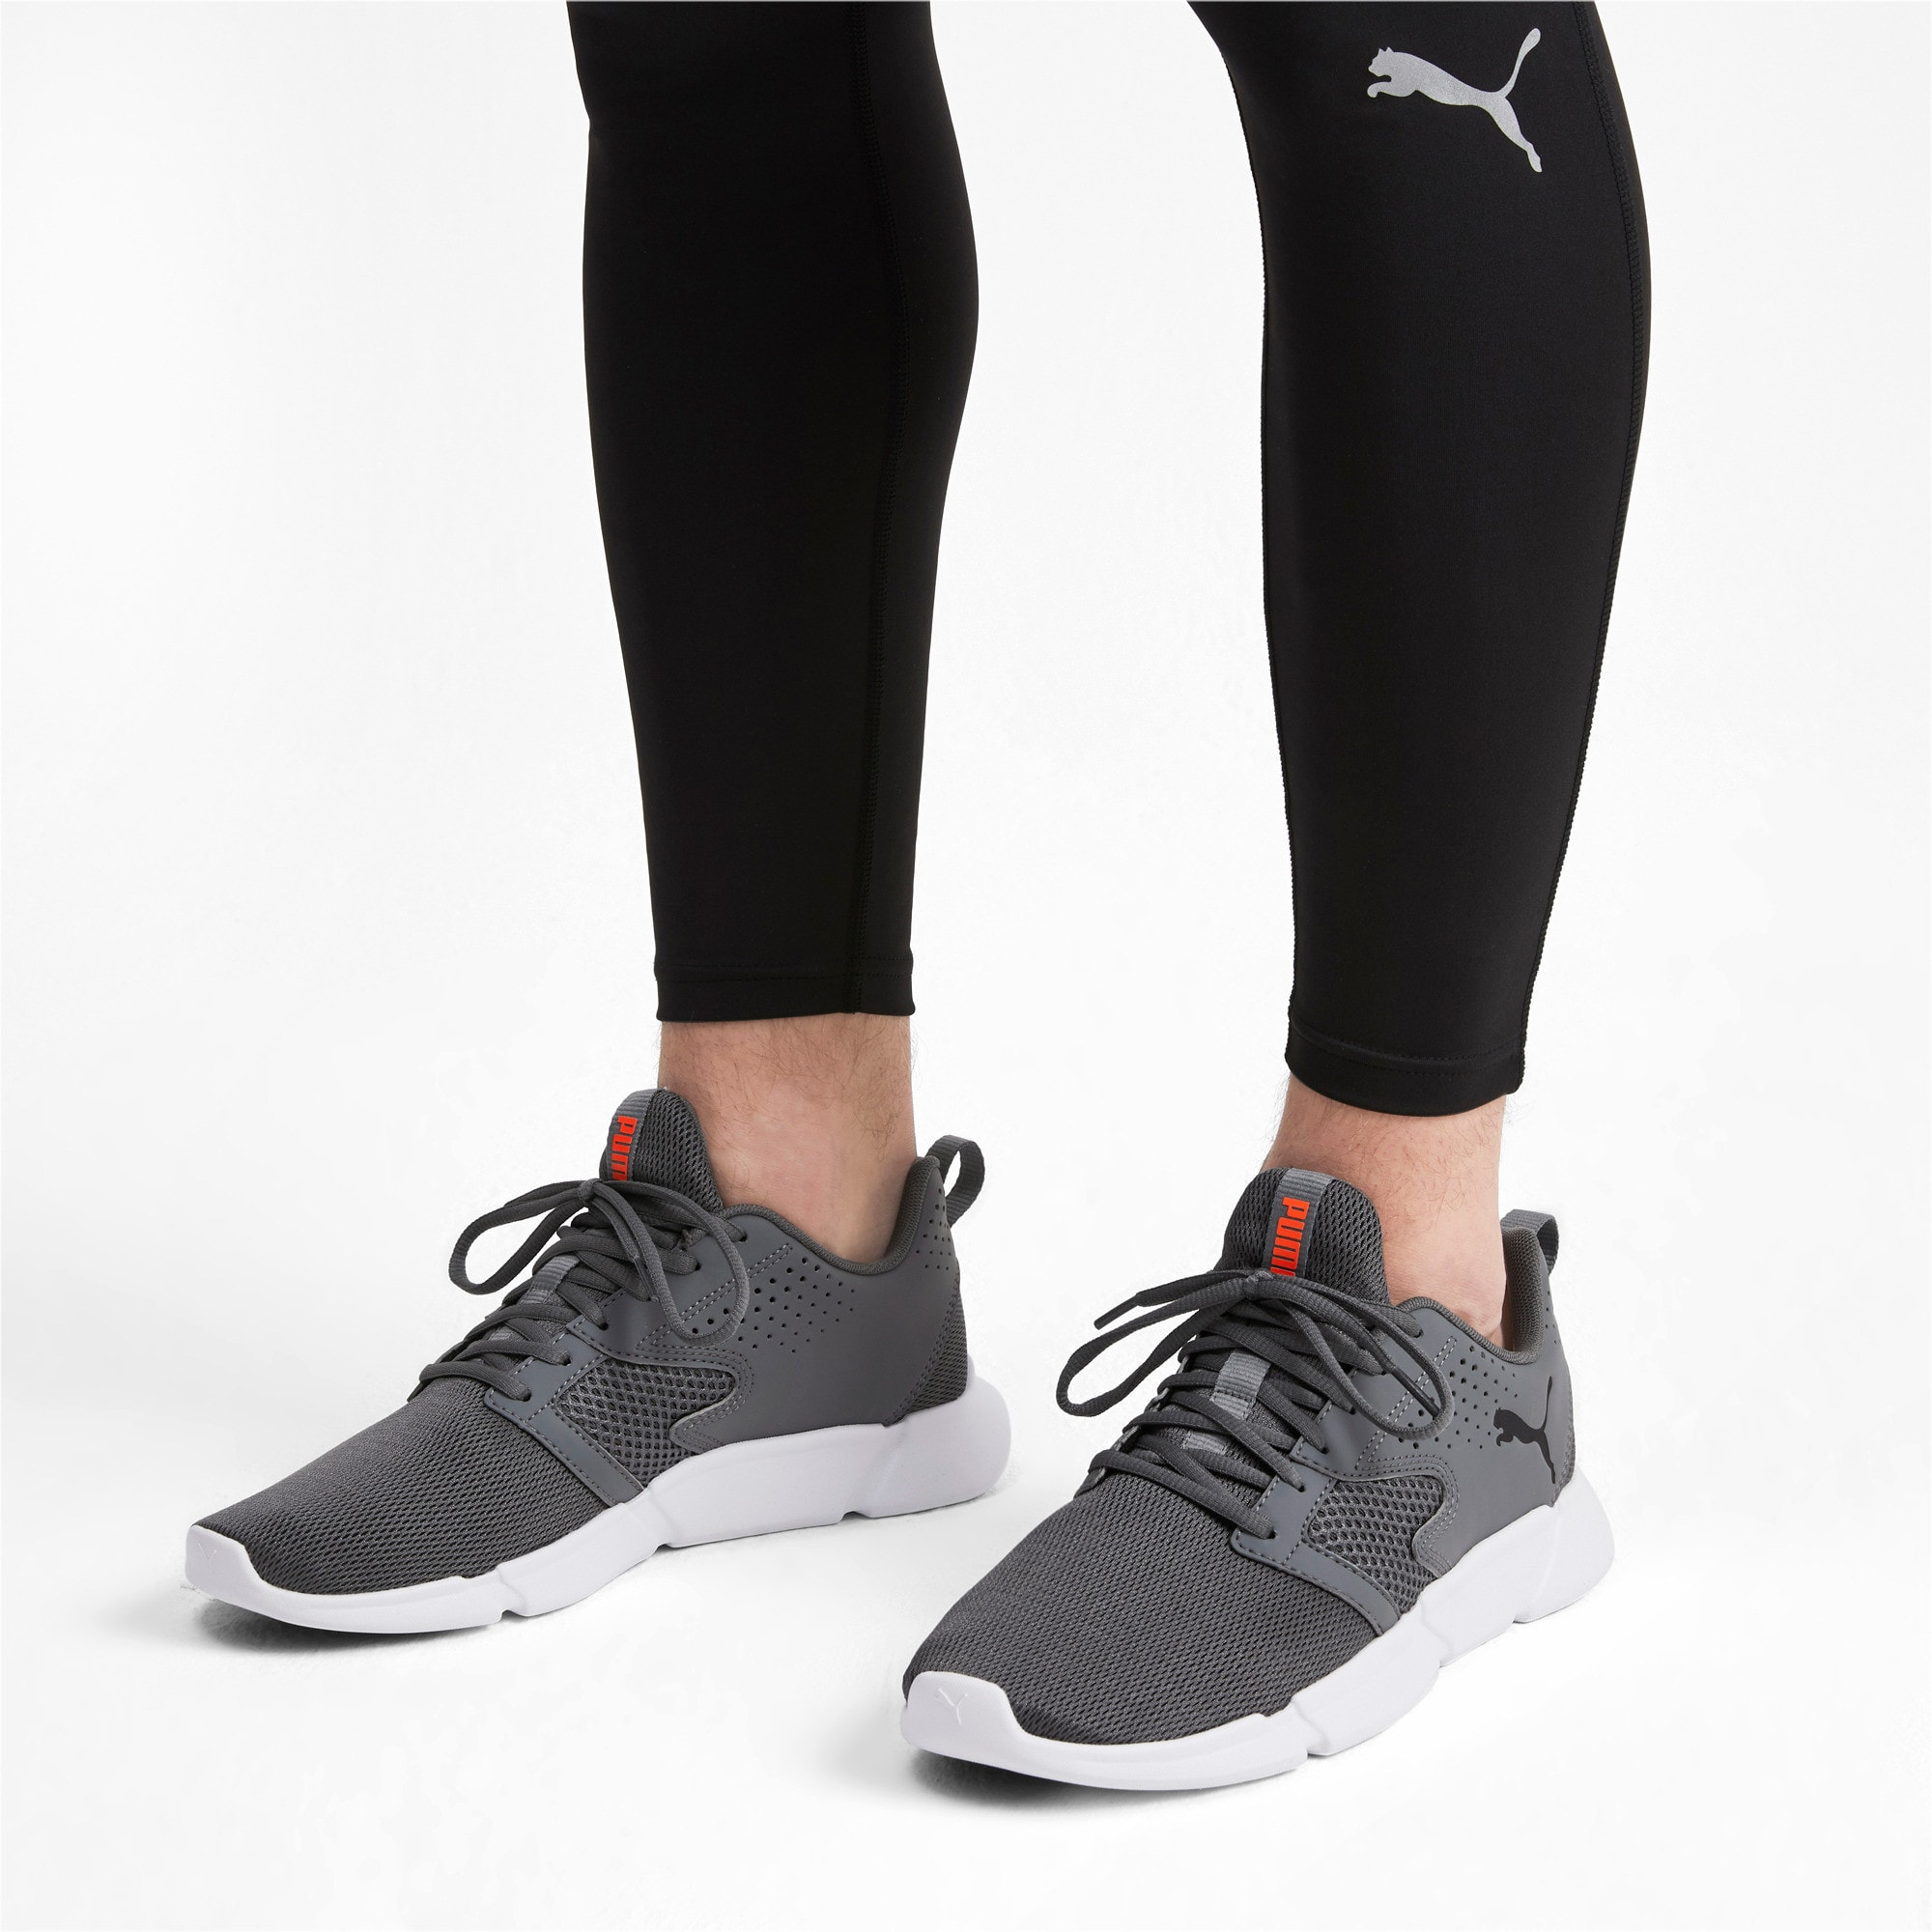 Thumbnail 2 of INTERFLEX Modern Running Shoes, CASTLEROCK-Black-Nrgy Red, medium-IND